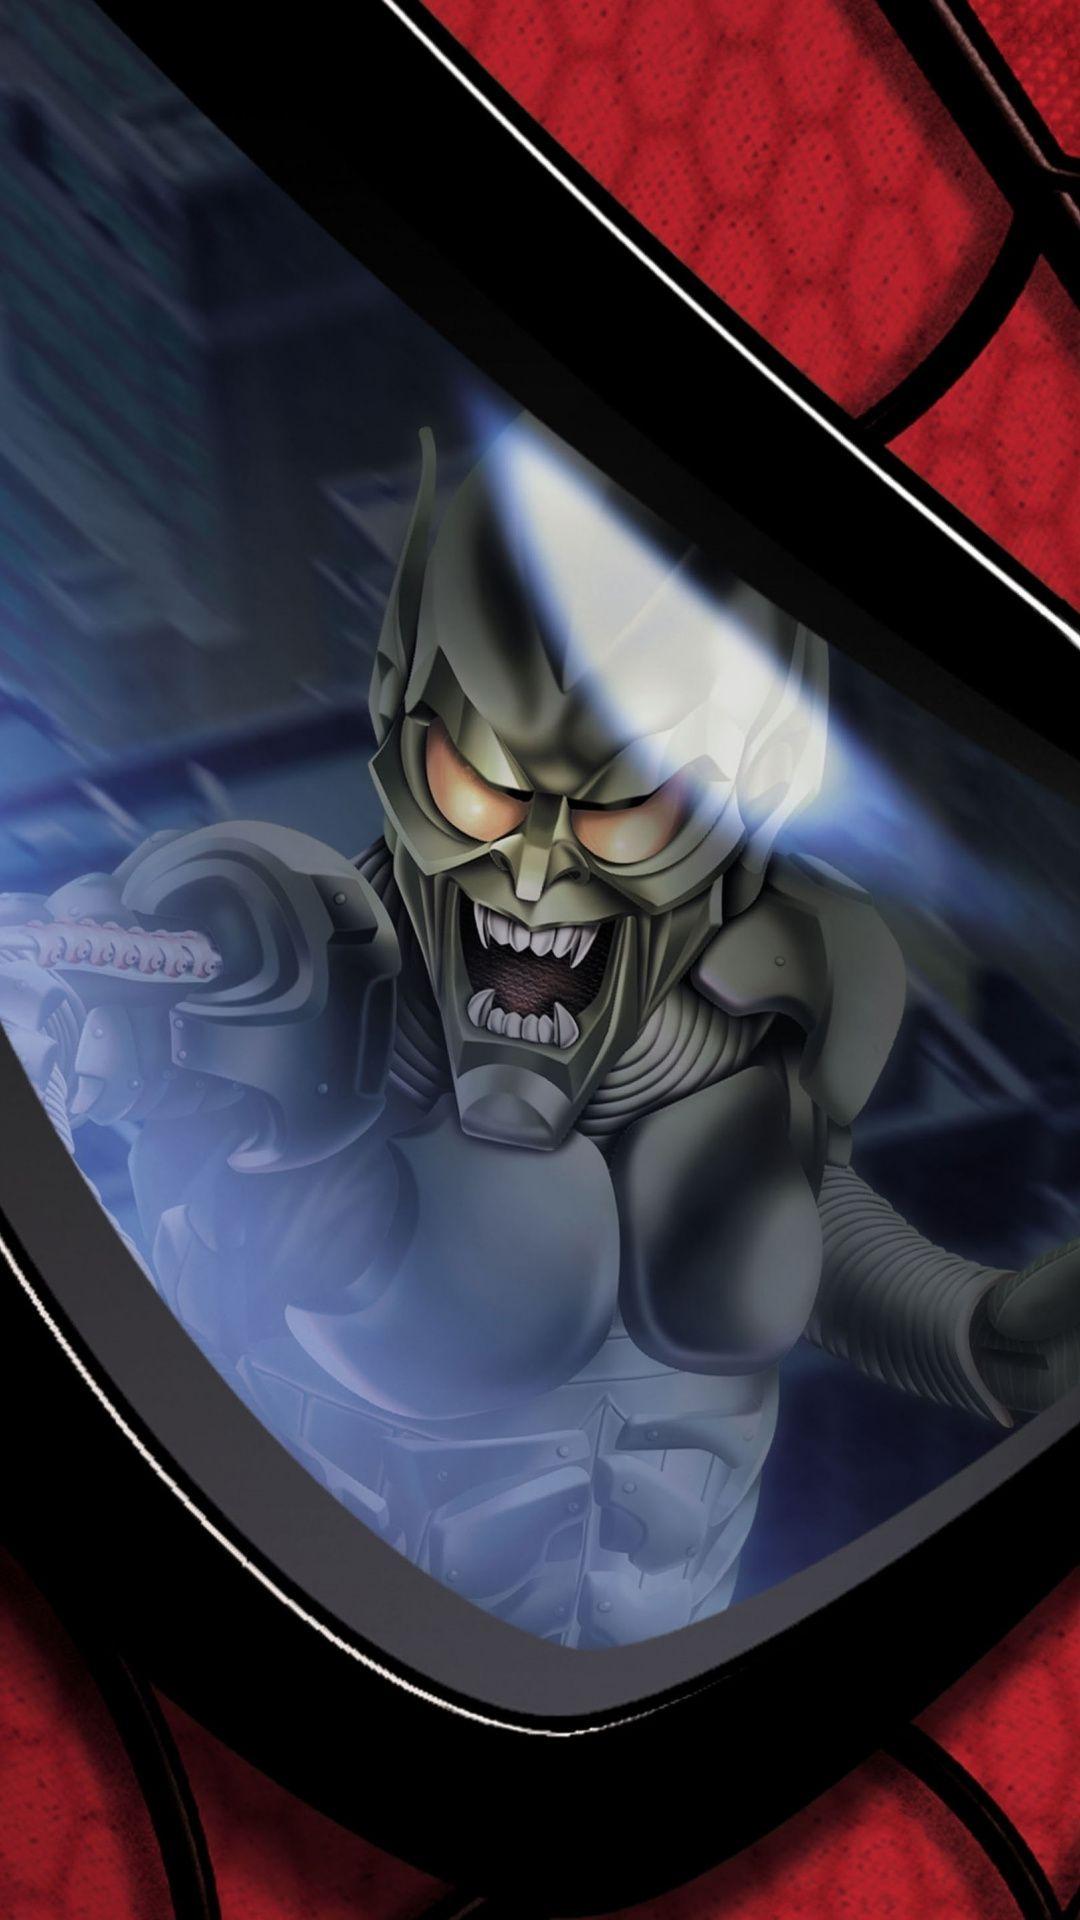 fbdd4a603dcb6 Green goblin, villain, Spider-man, eye's reflection, movie, 1080x1920  wallpaper